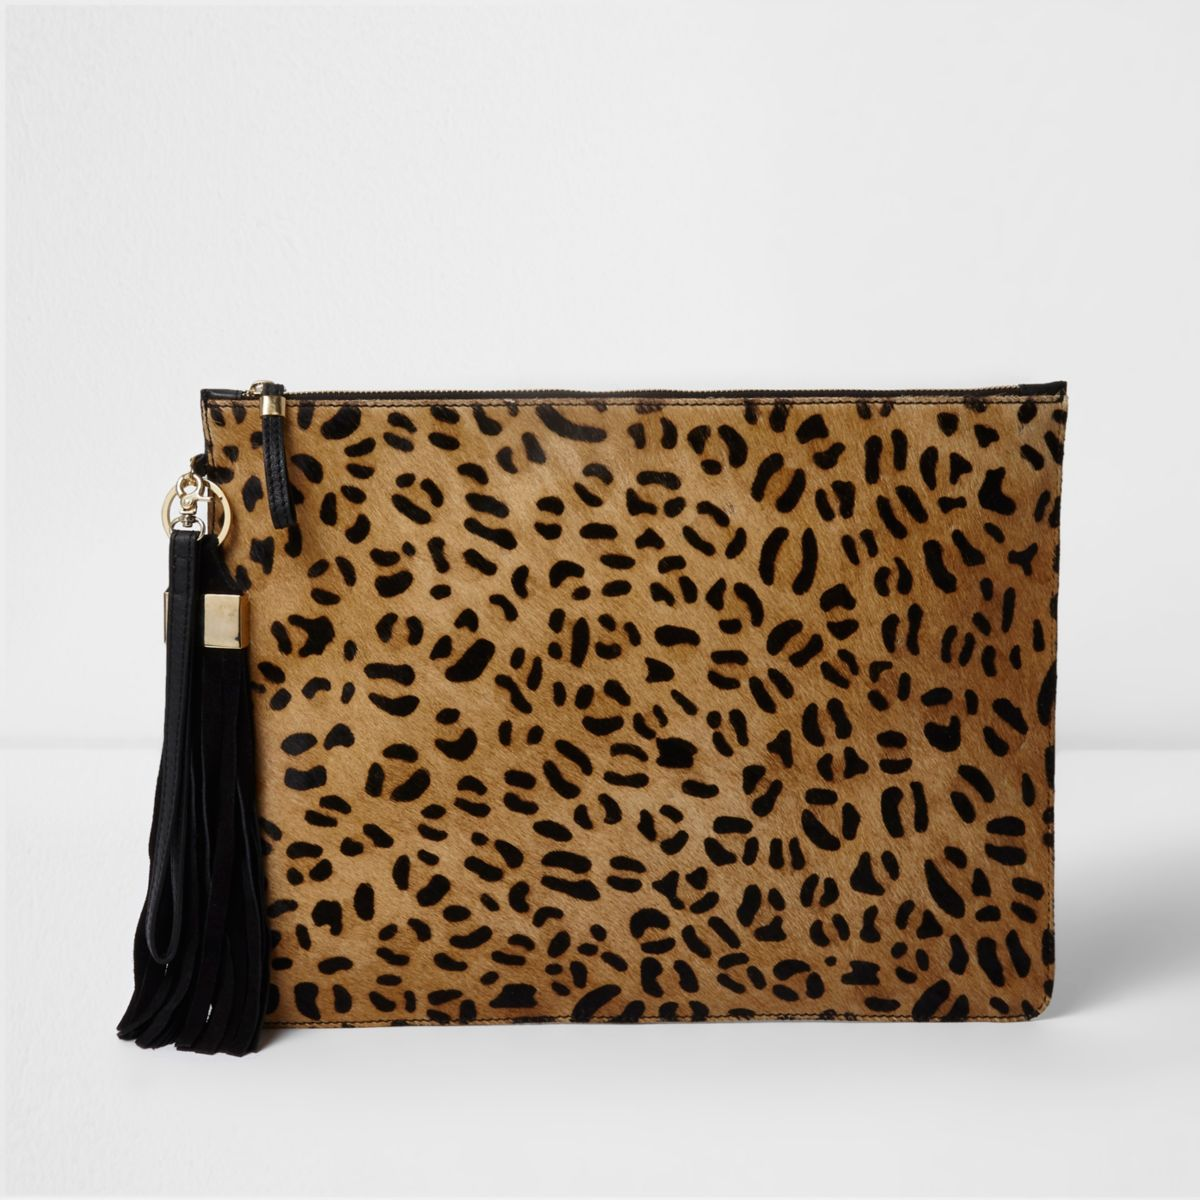 Beige leopard print leather clutch bag